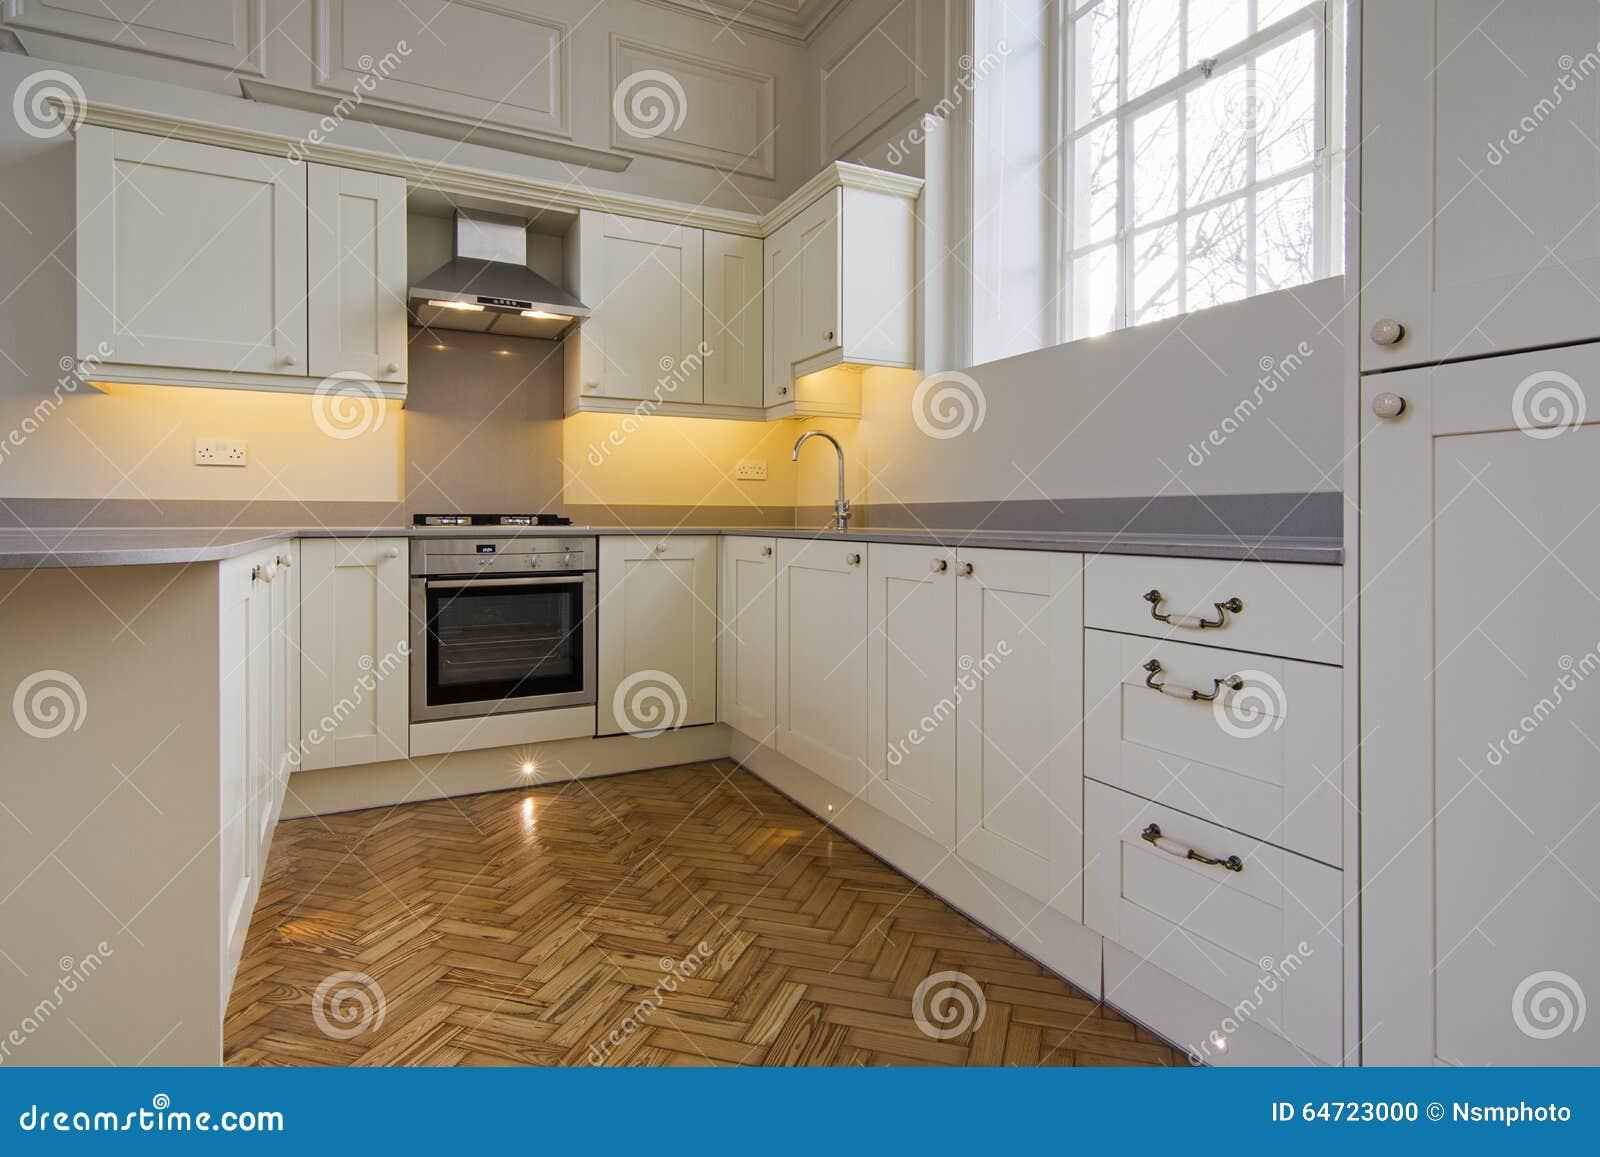 Ingerichte kamers paars - Foto eigentijdse keuken ...